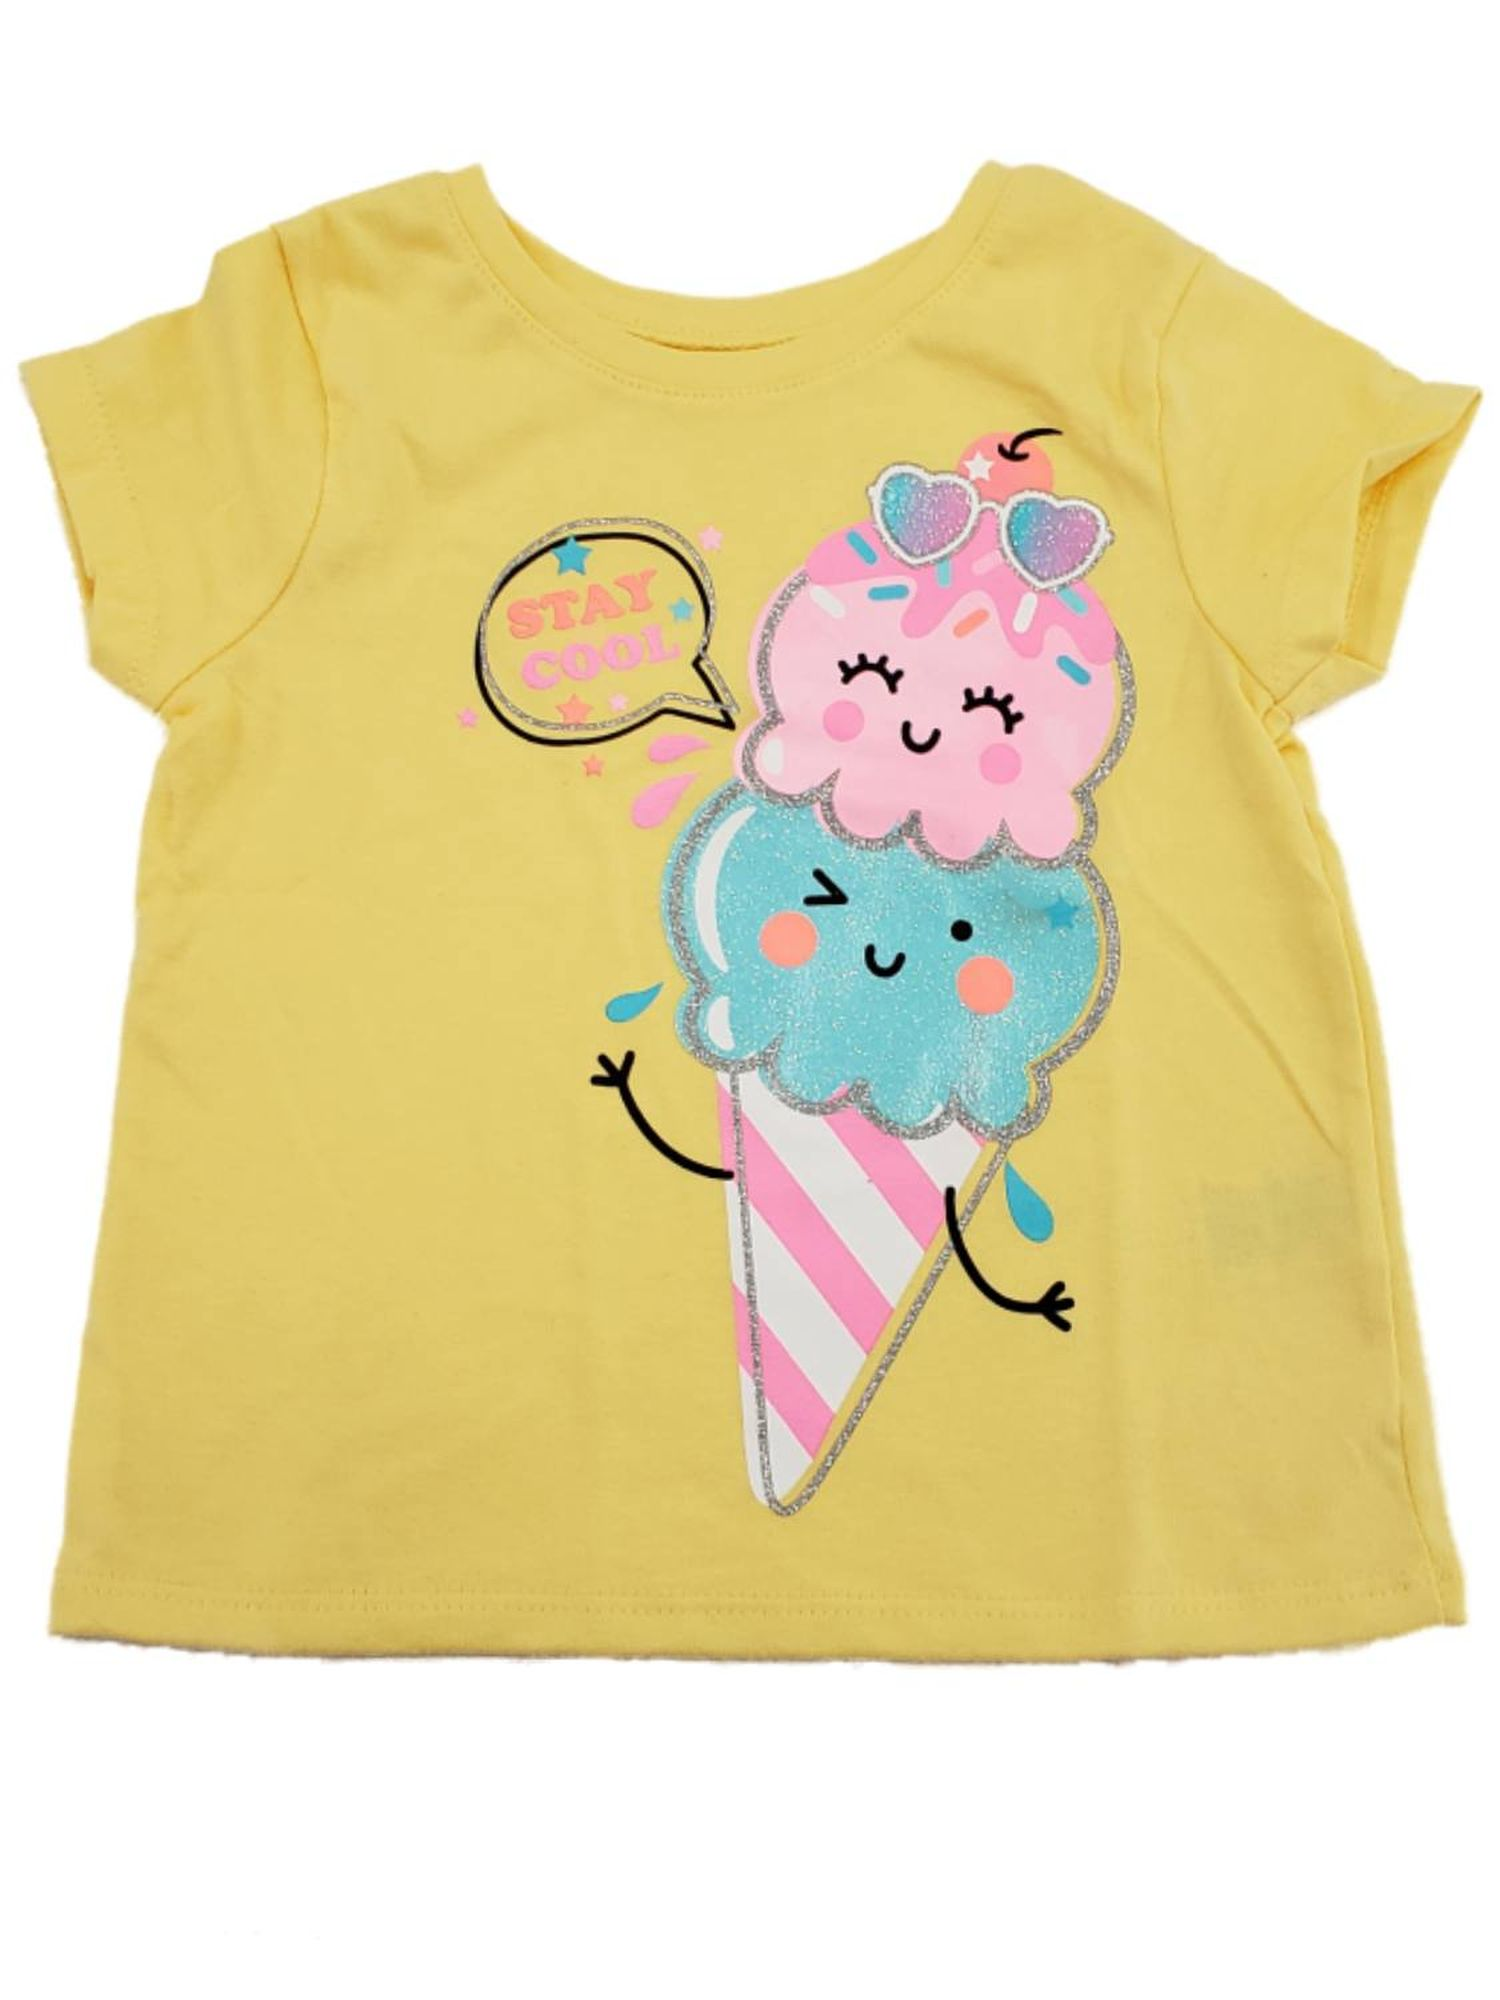 7 ate 9 Apparel Kids Ice Cream Unicorn Raglan Tee Pink